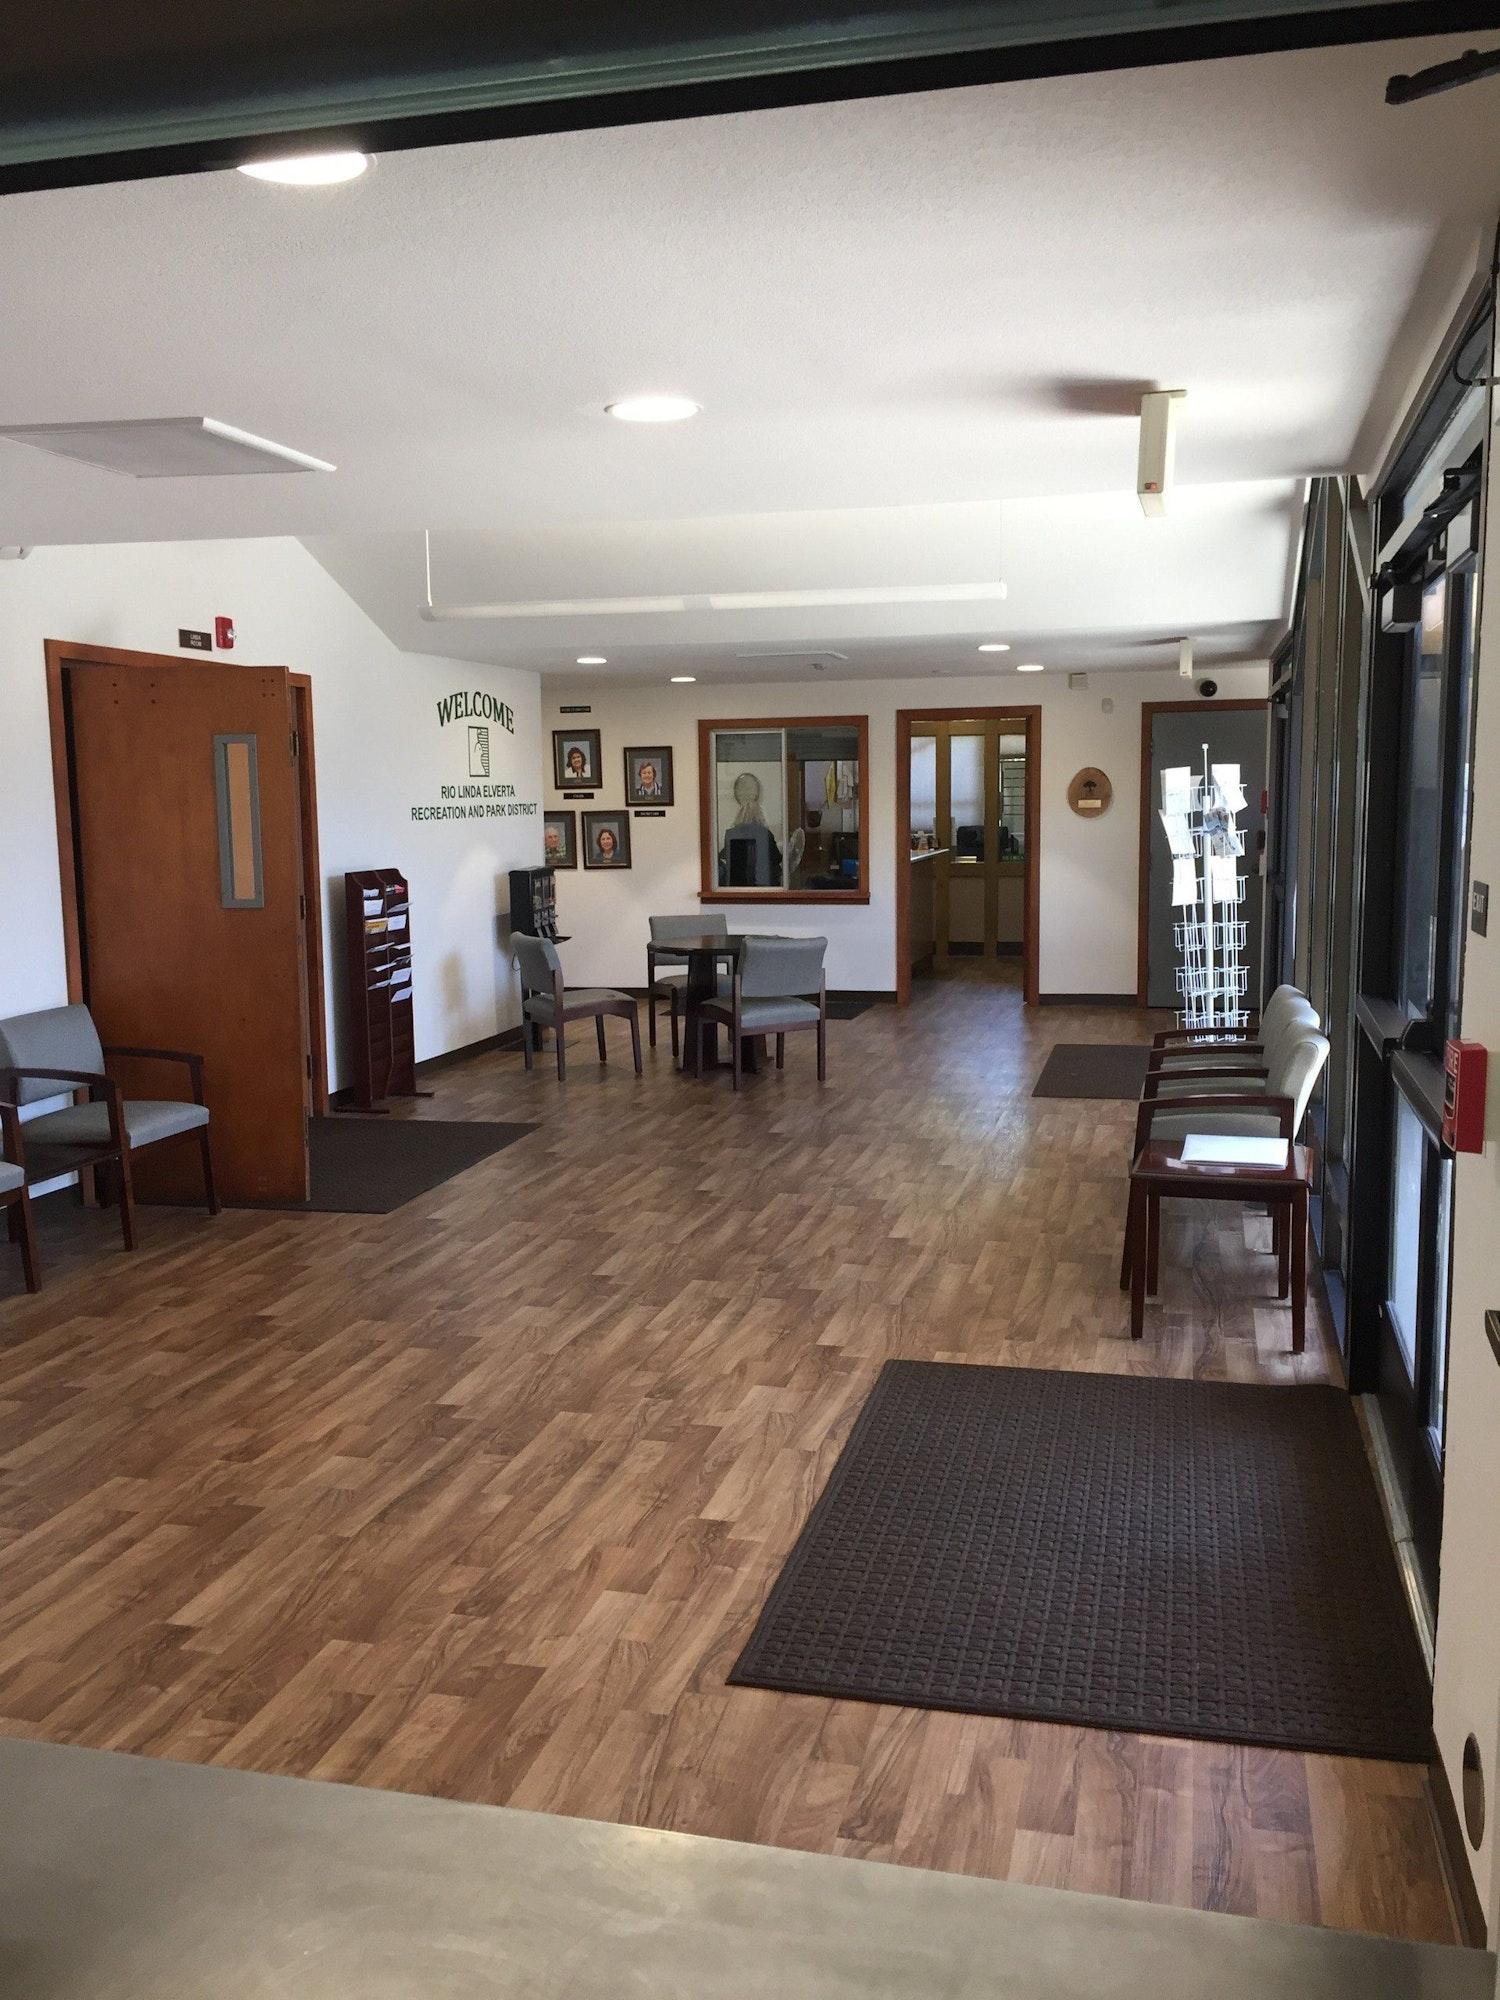 May contain: flooring, person, human, floor, wood, and hardwood